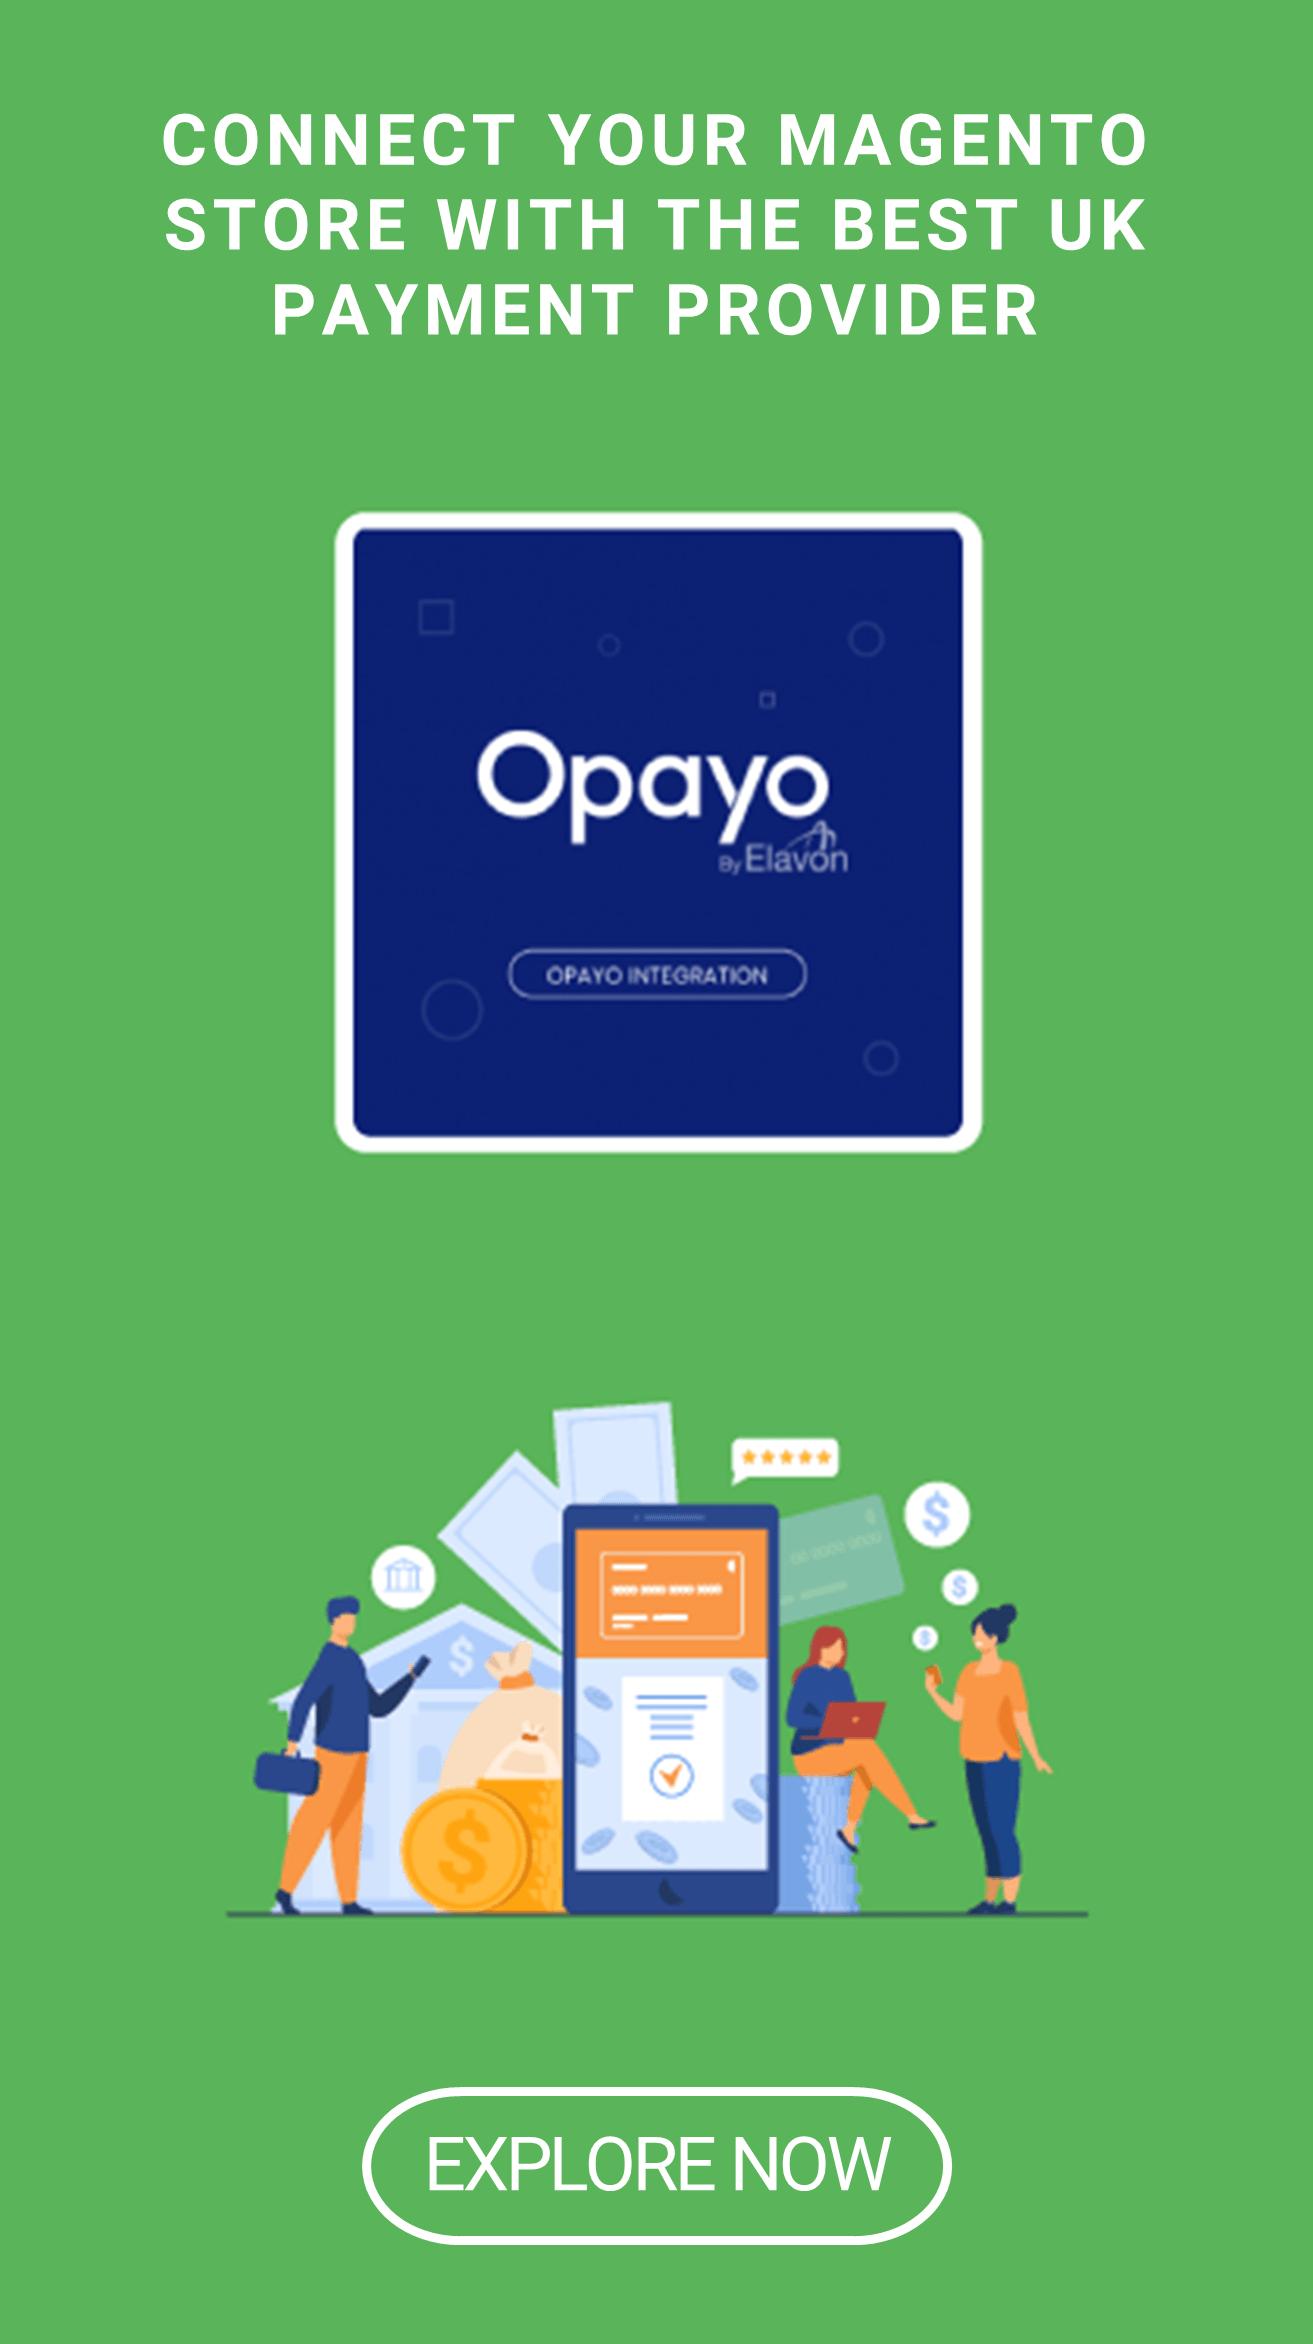 Magento 2 Opayo (Sage Pay)